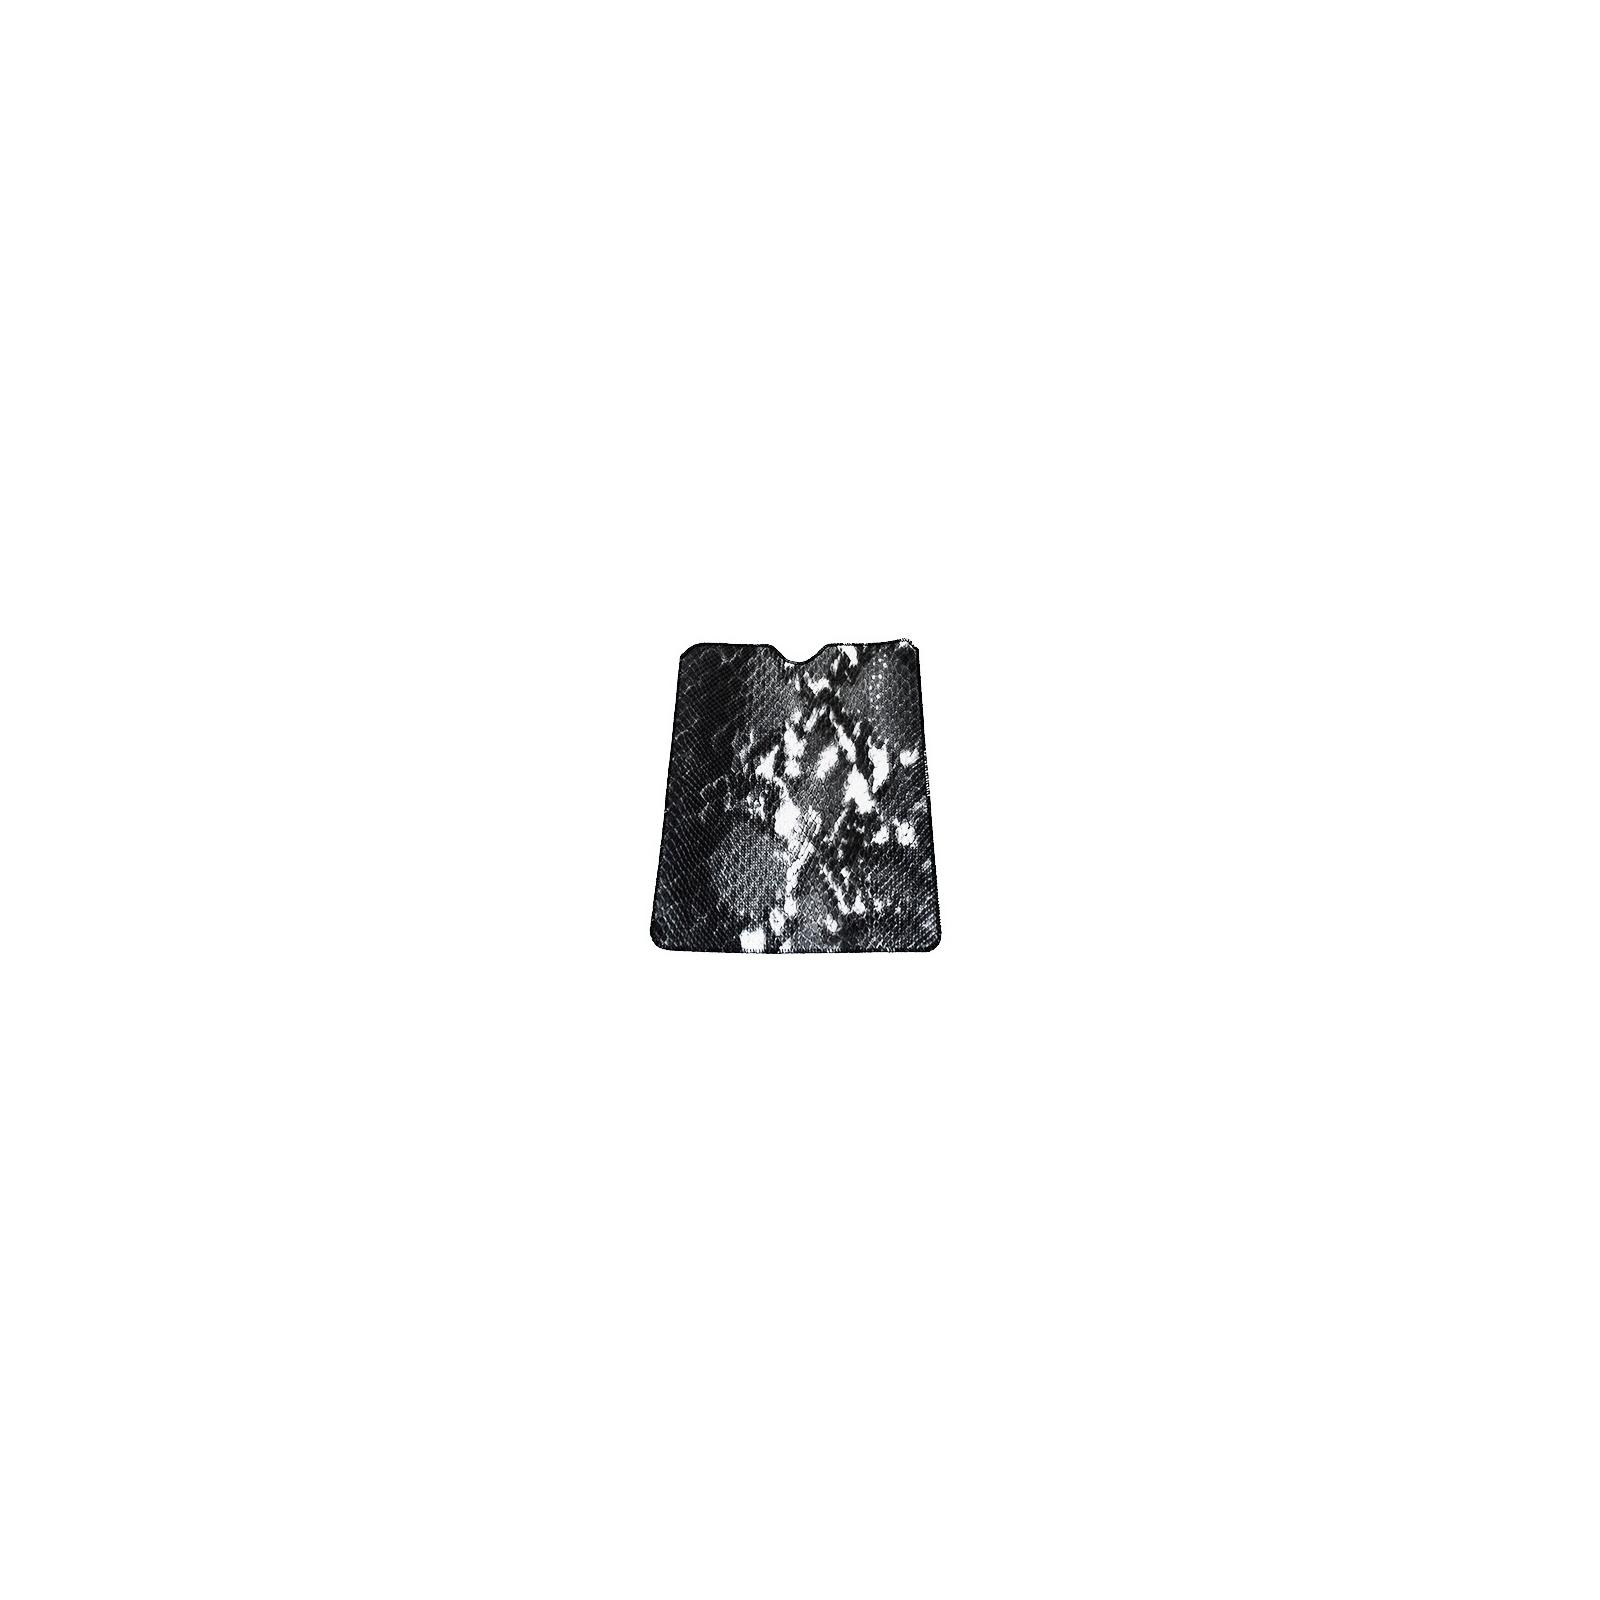 "Чехол для планшета Drobak 9.7-10.1"" Universal/Сrocodile Case /Black (216828)"